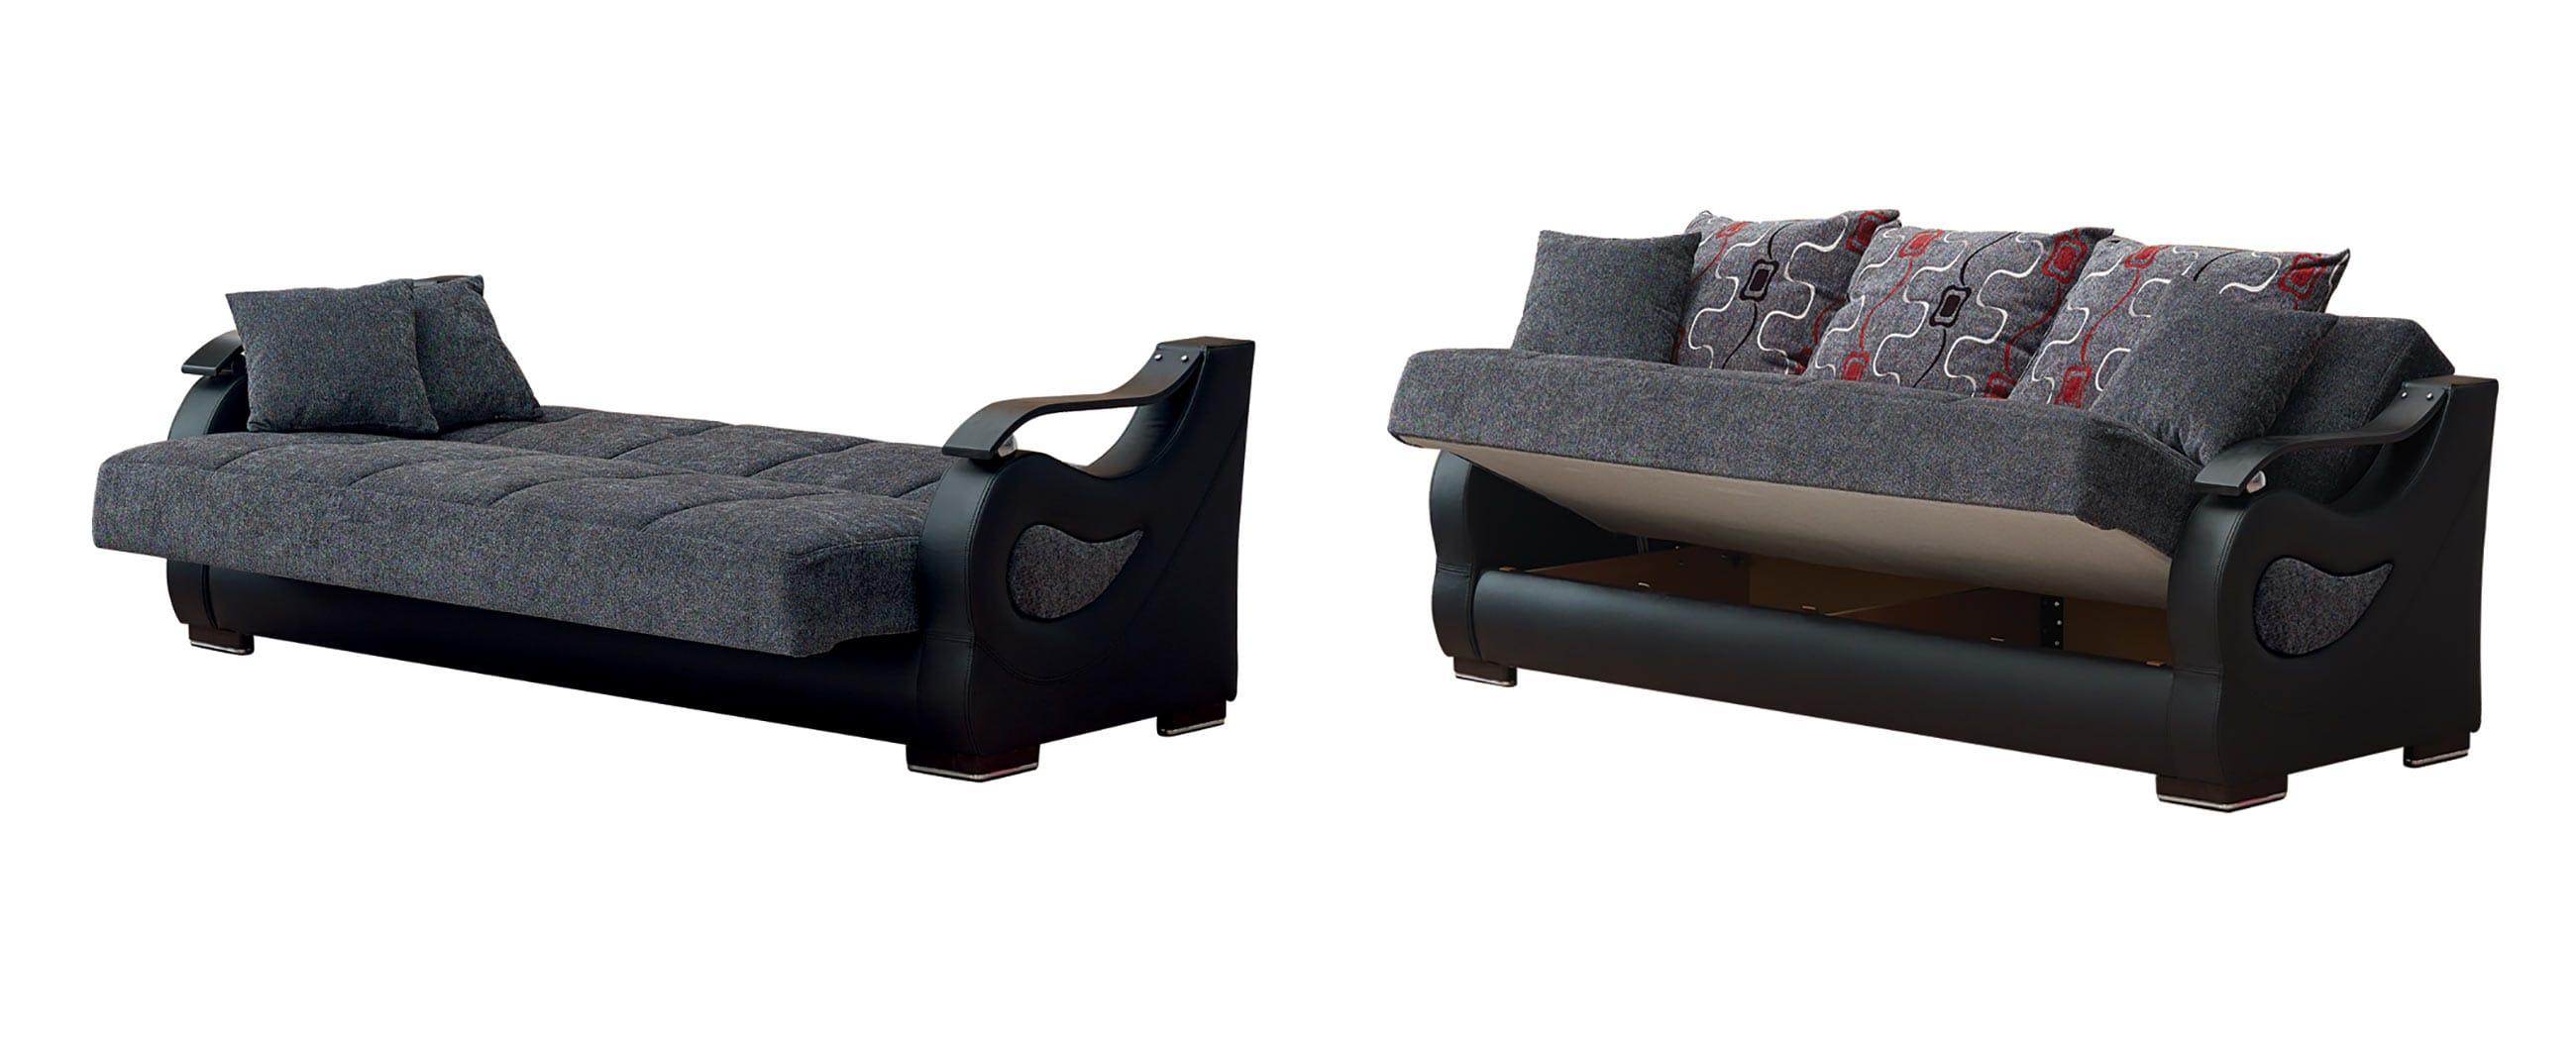 sofa beds phoenix arizona sleeper sofas in houston texas gray fabric bed by empire furniture usa